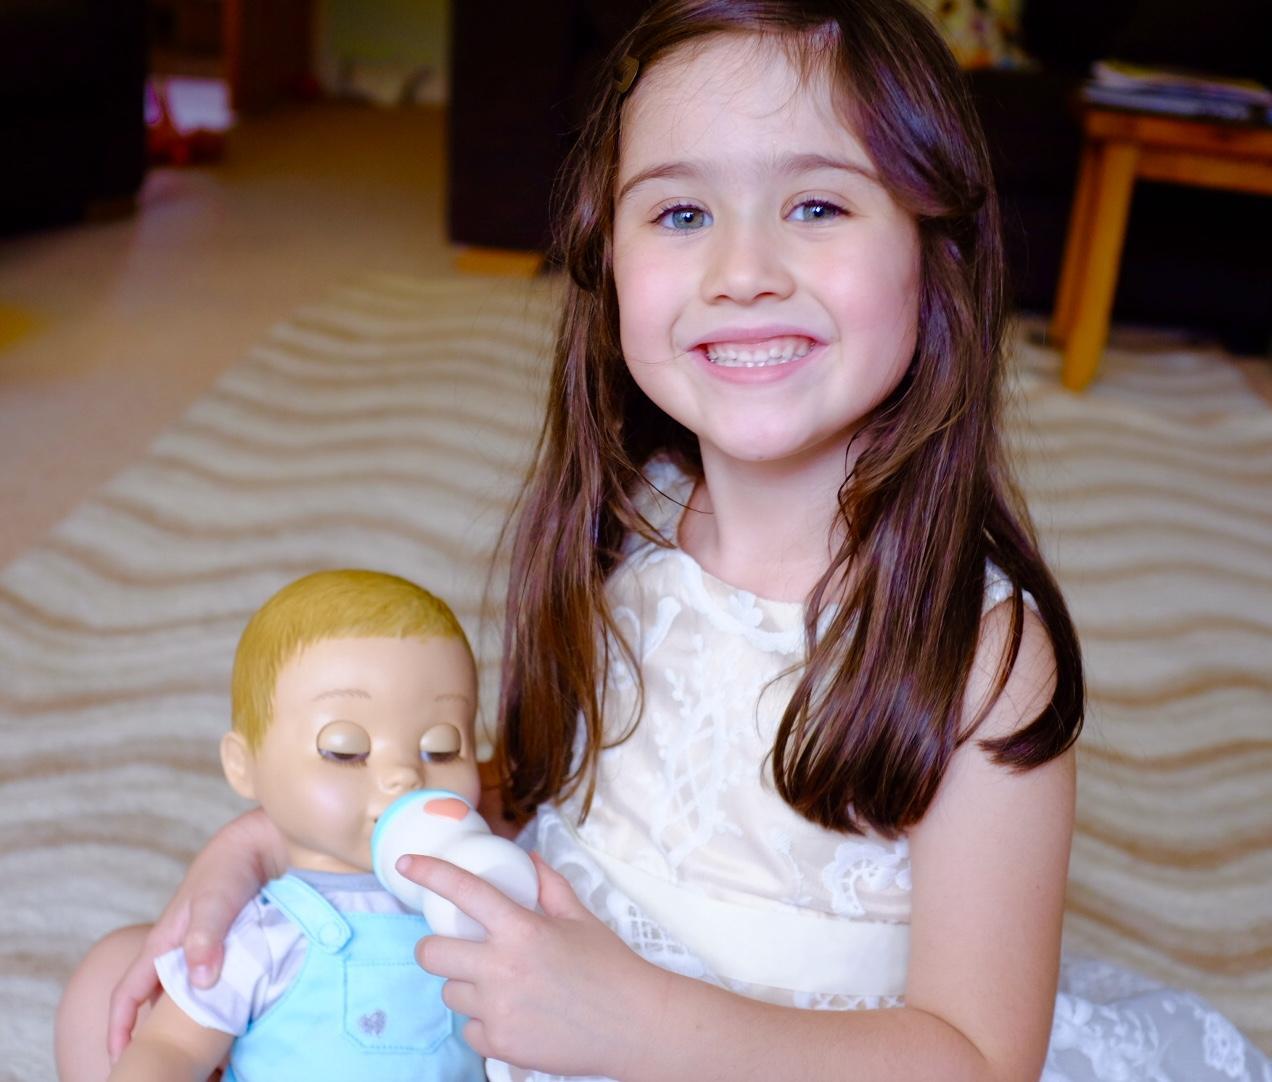 girl feeding Luvabeau doll with bottle